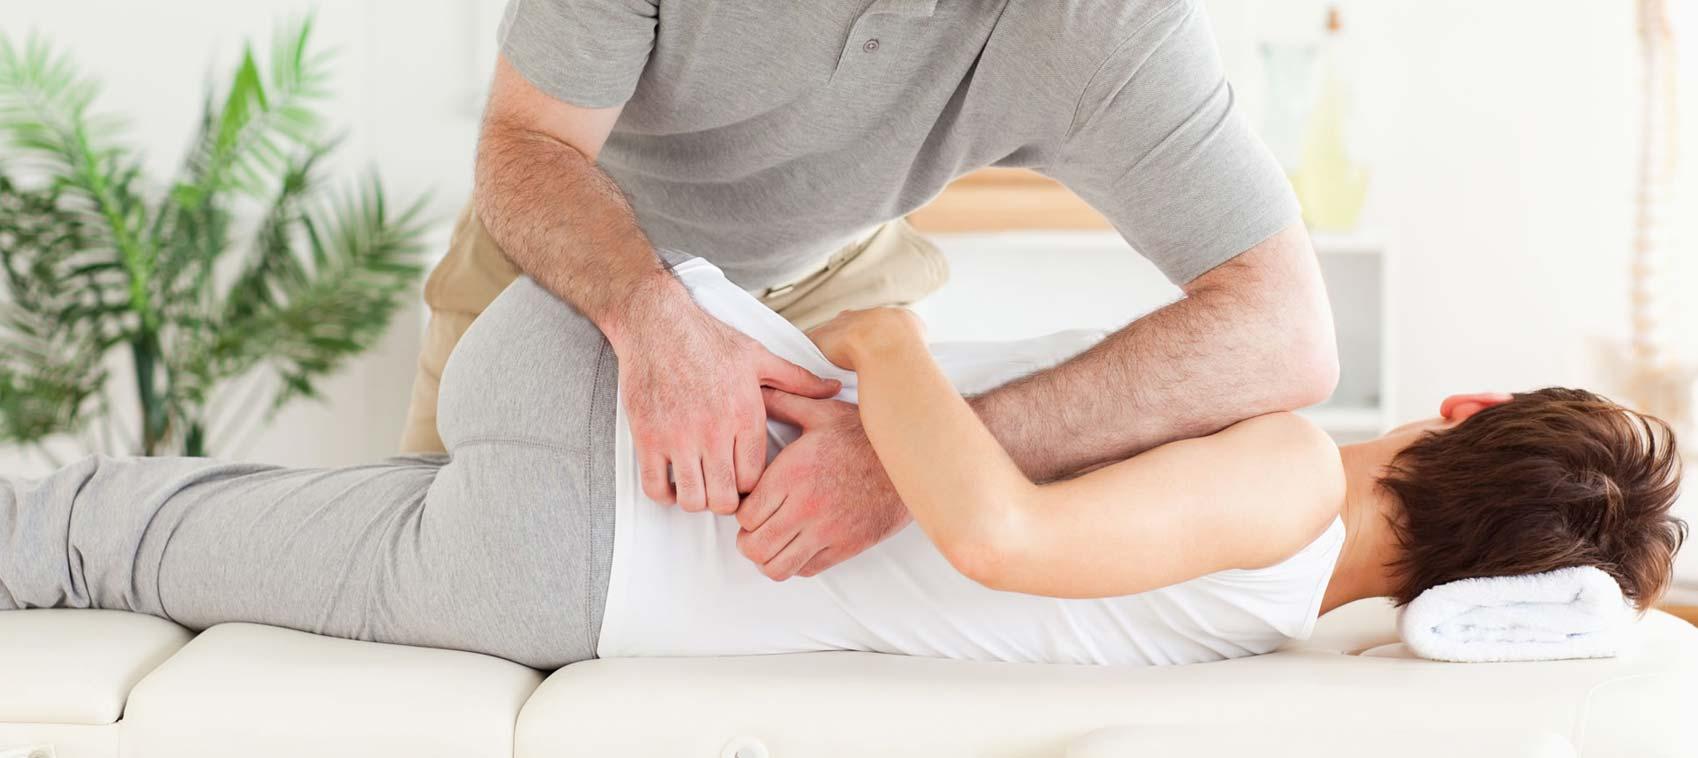 spinal-mobilation-manipulation